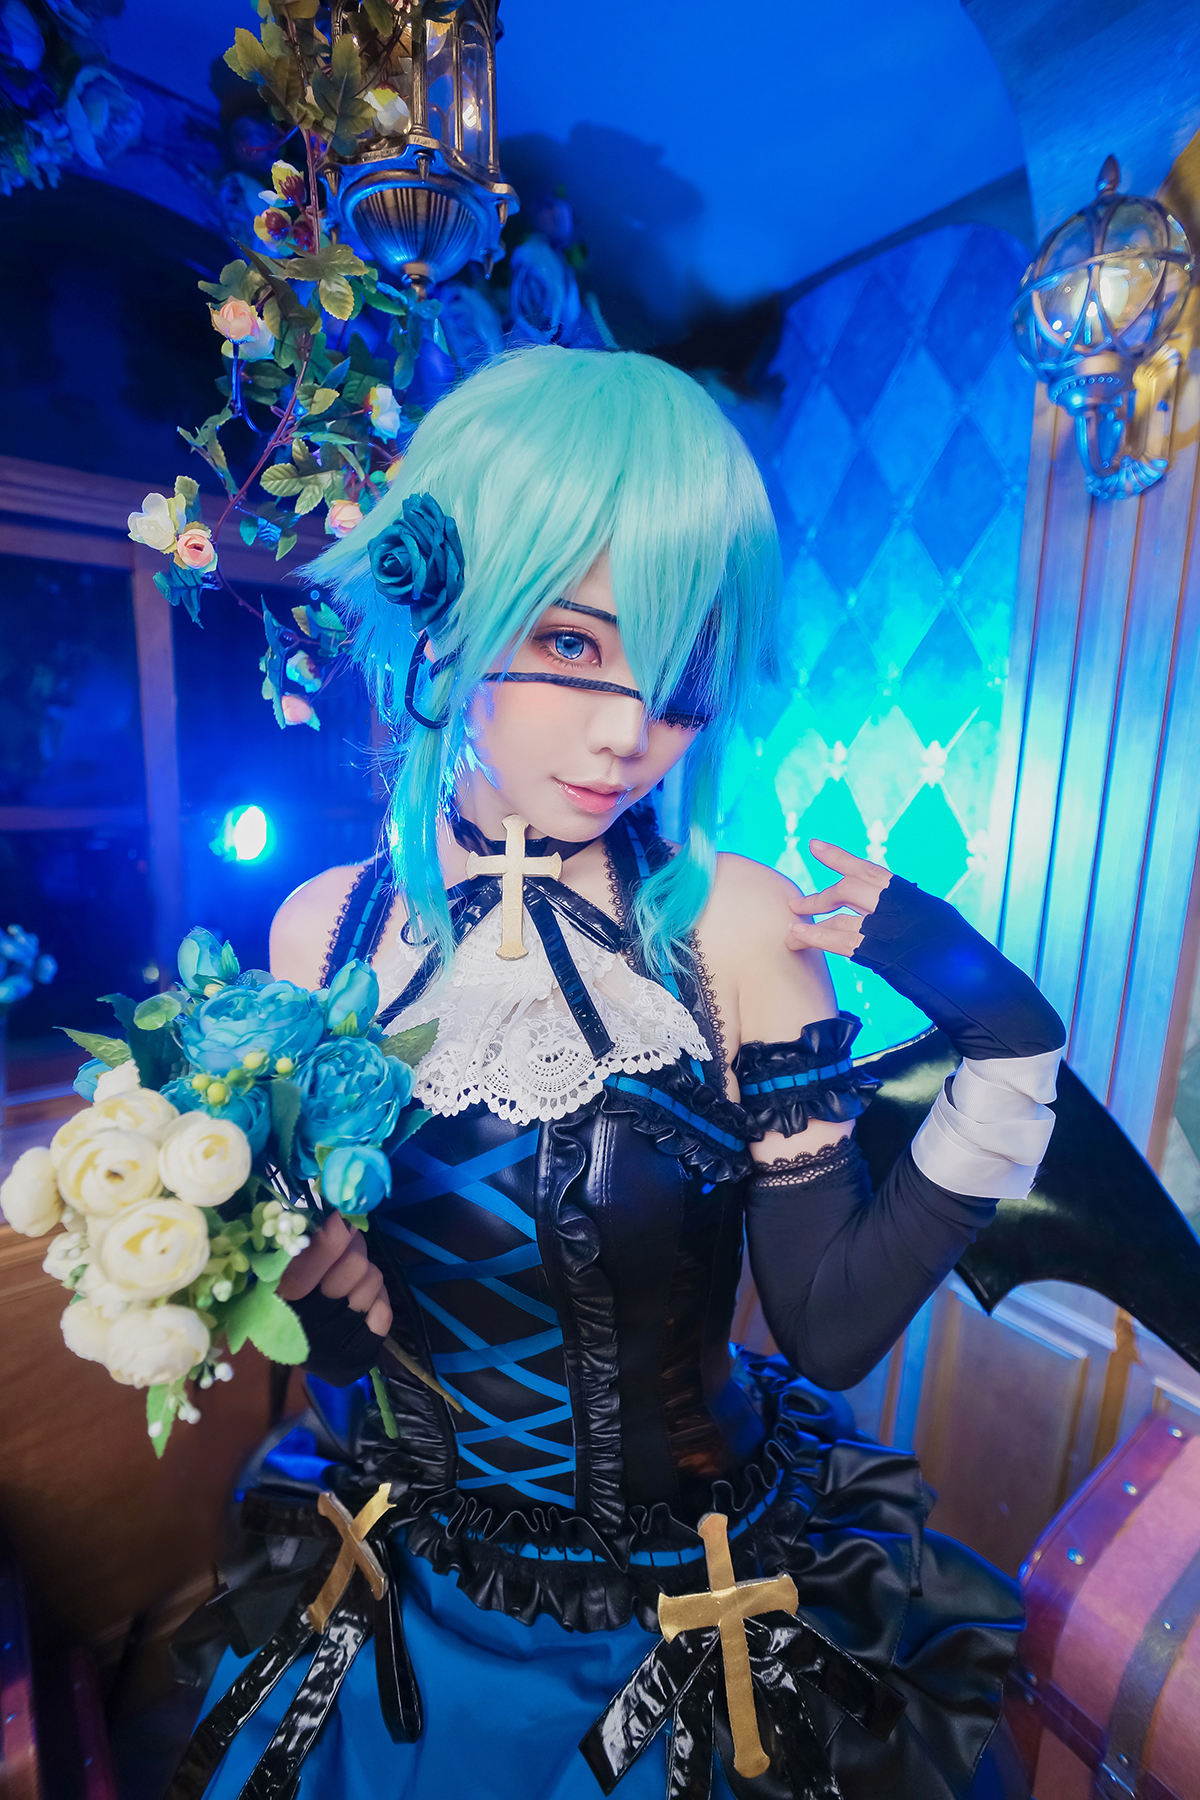 Sword Art Online, фото, косплей, cosplay, Синон, Sinon, SAO, GGO, Halloween, Ely